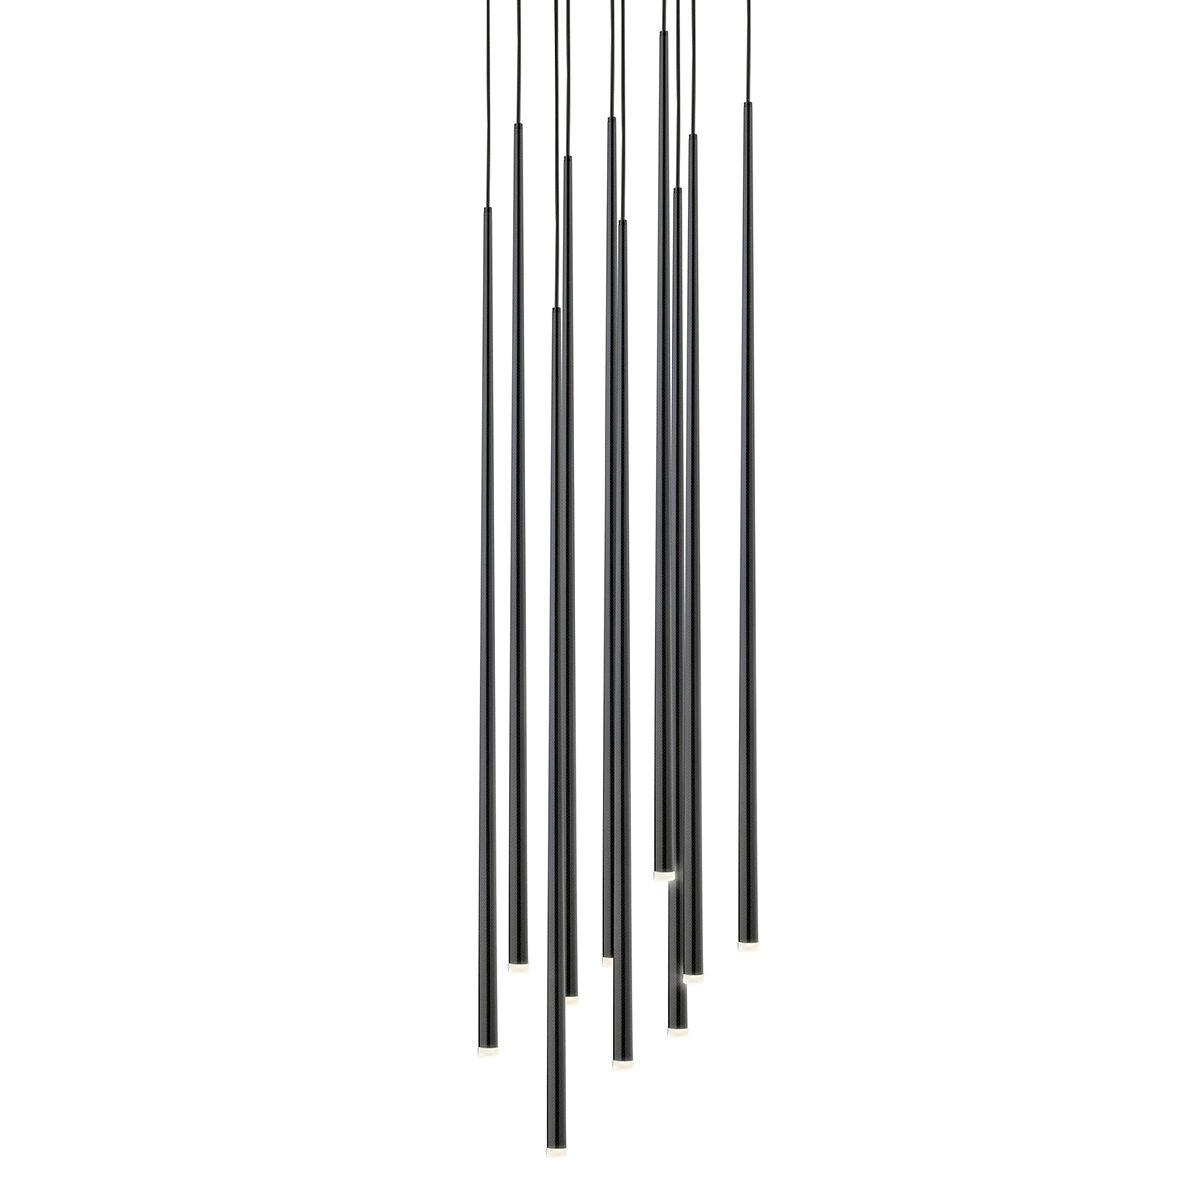 Slim Seven Light Pendant By Vibia 0916 04 12